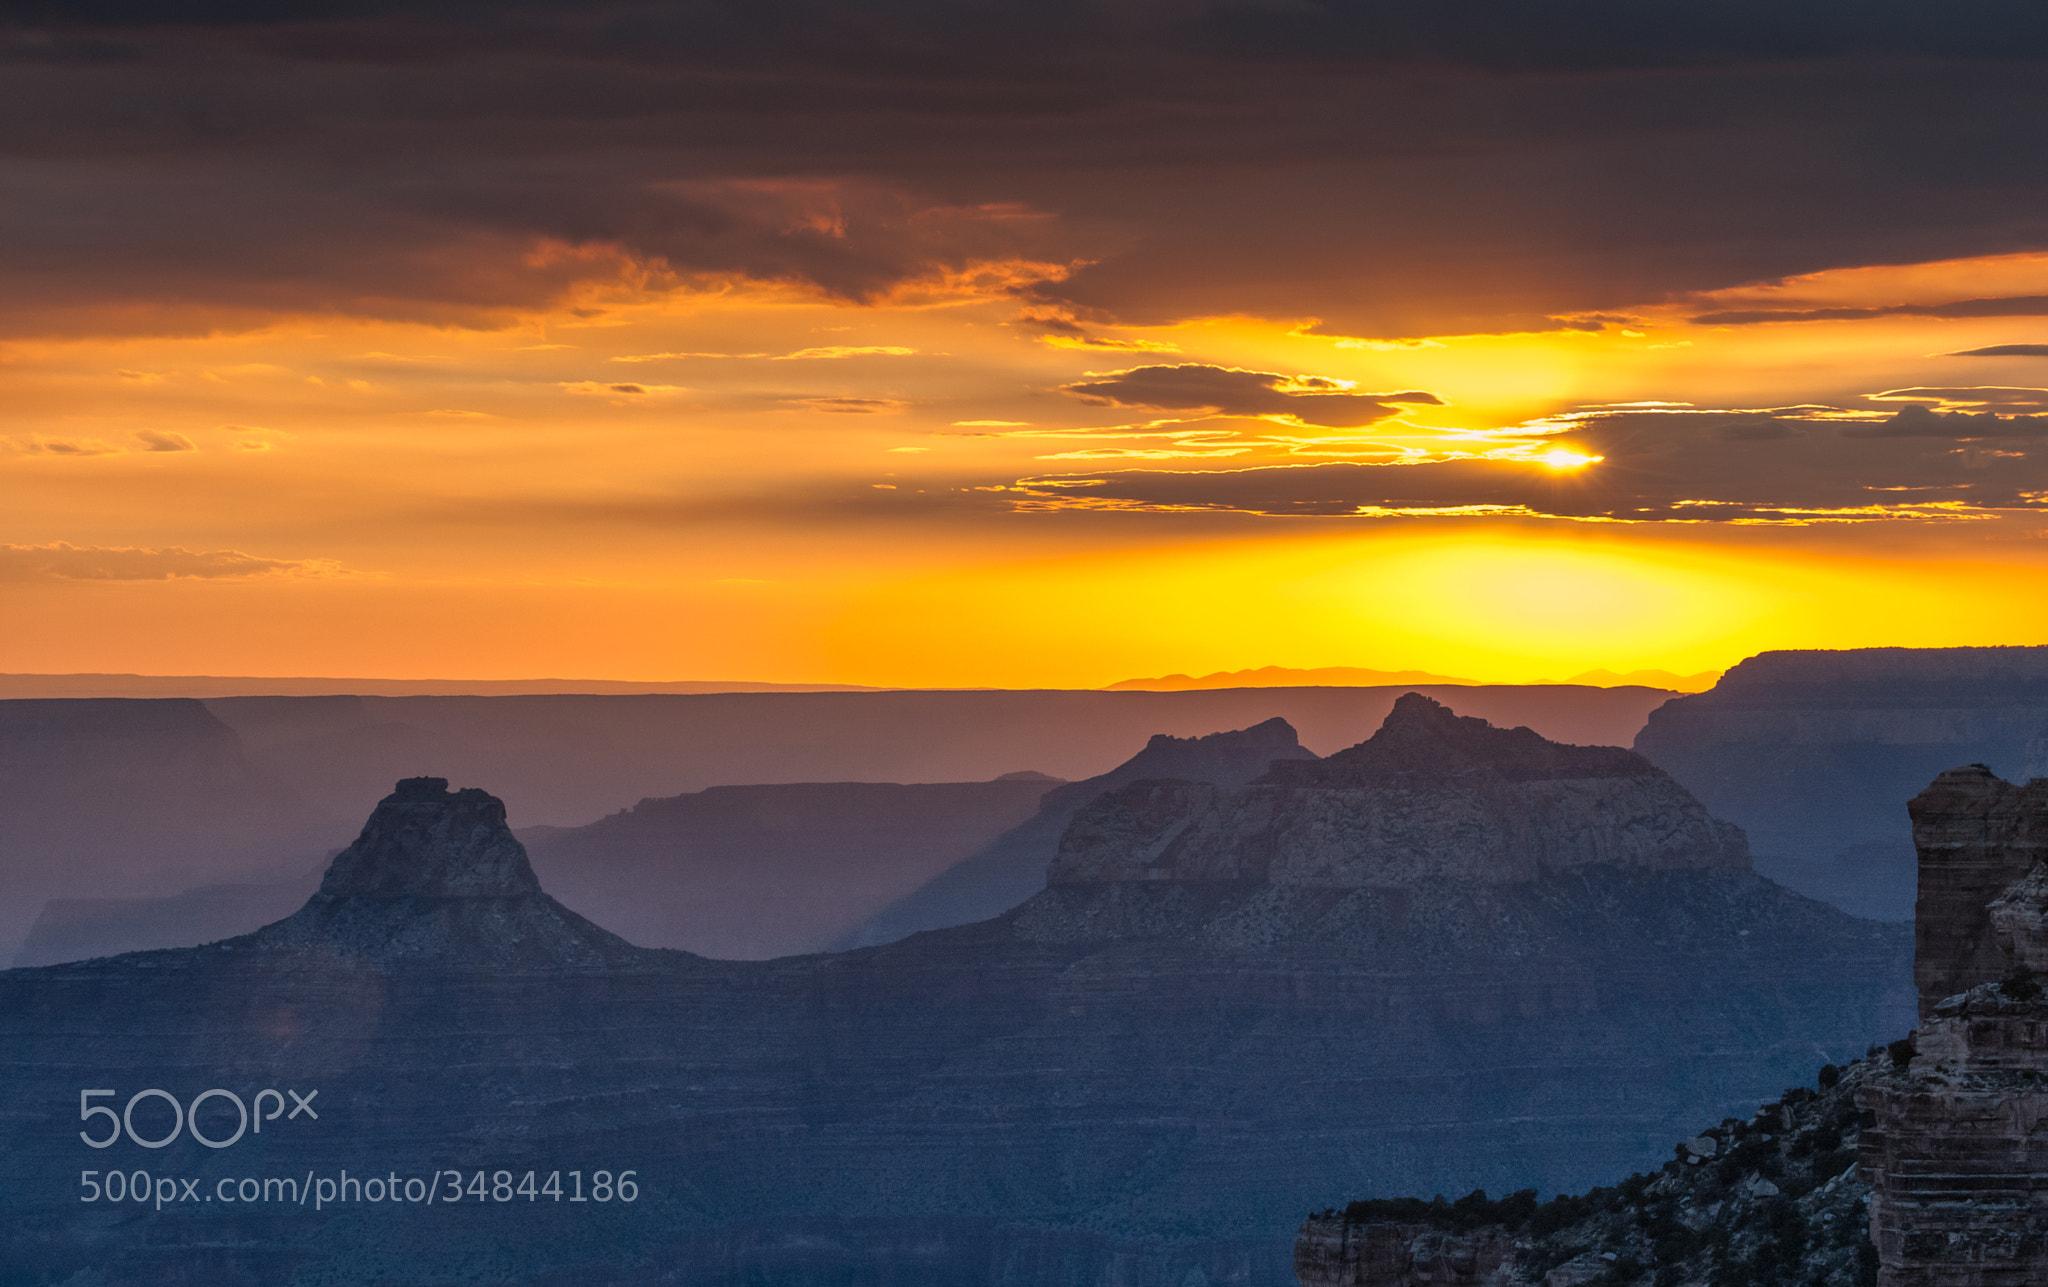 Photograph Arizona Skies by Keith Skelton on 500px